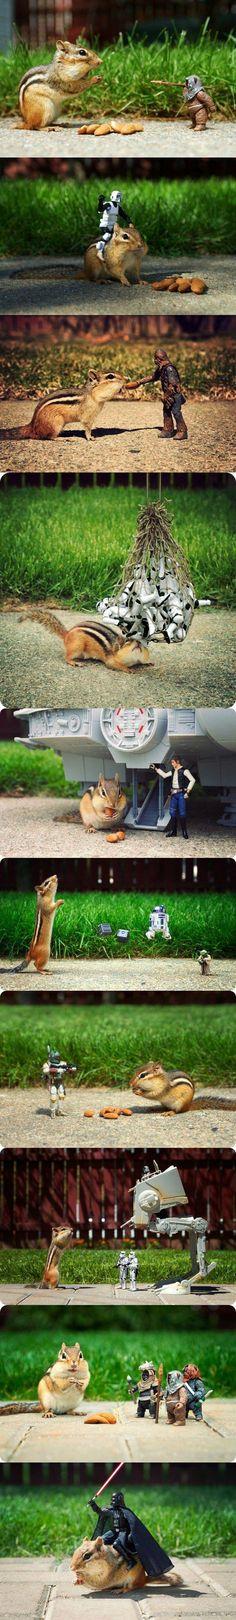 star wars and chipmunks